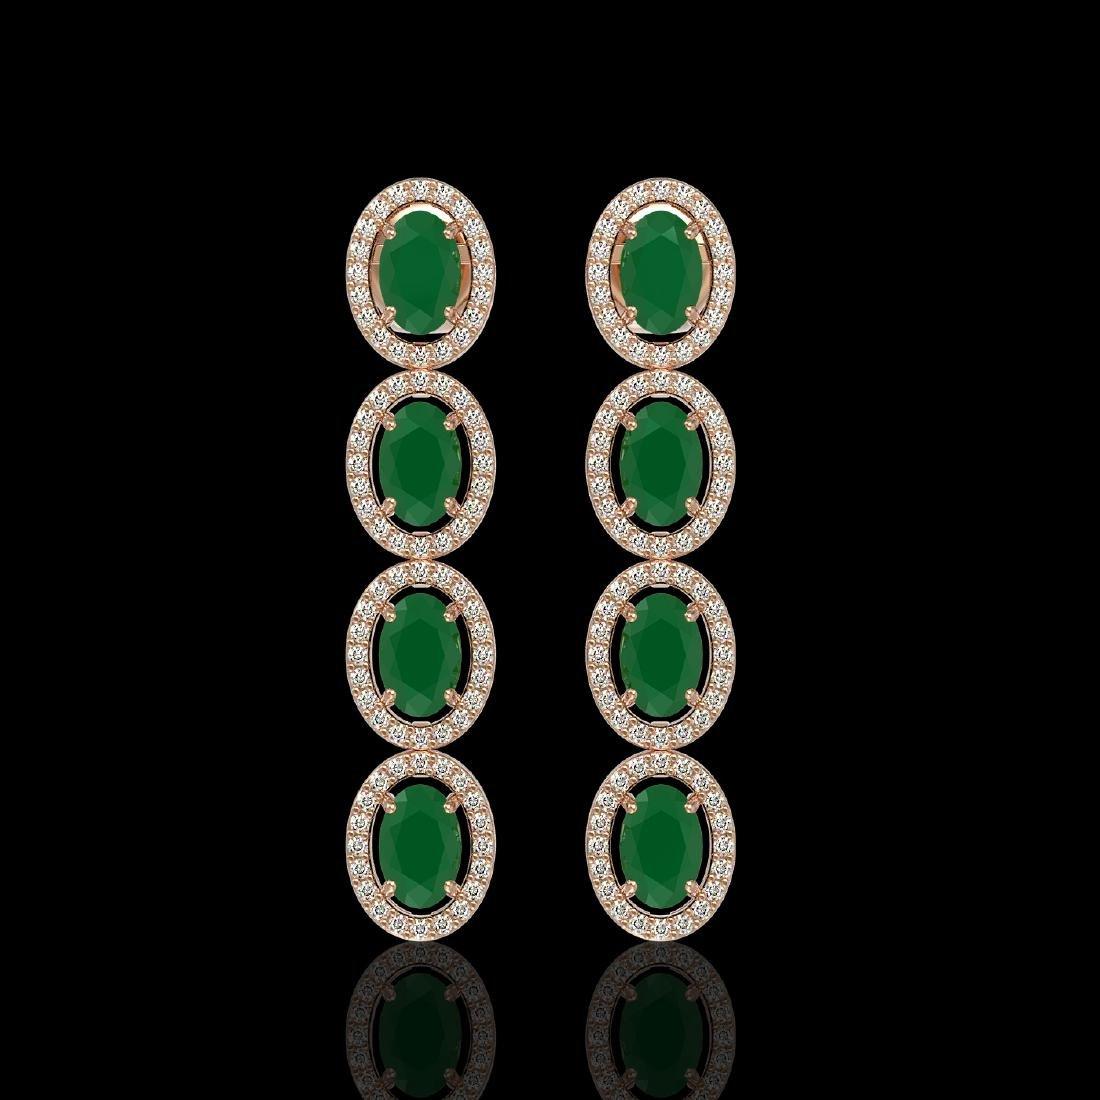 6.47 CTW Emerald & Diamond Halo Earrings 10K Rose Gold